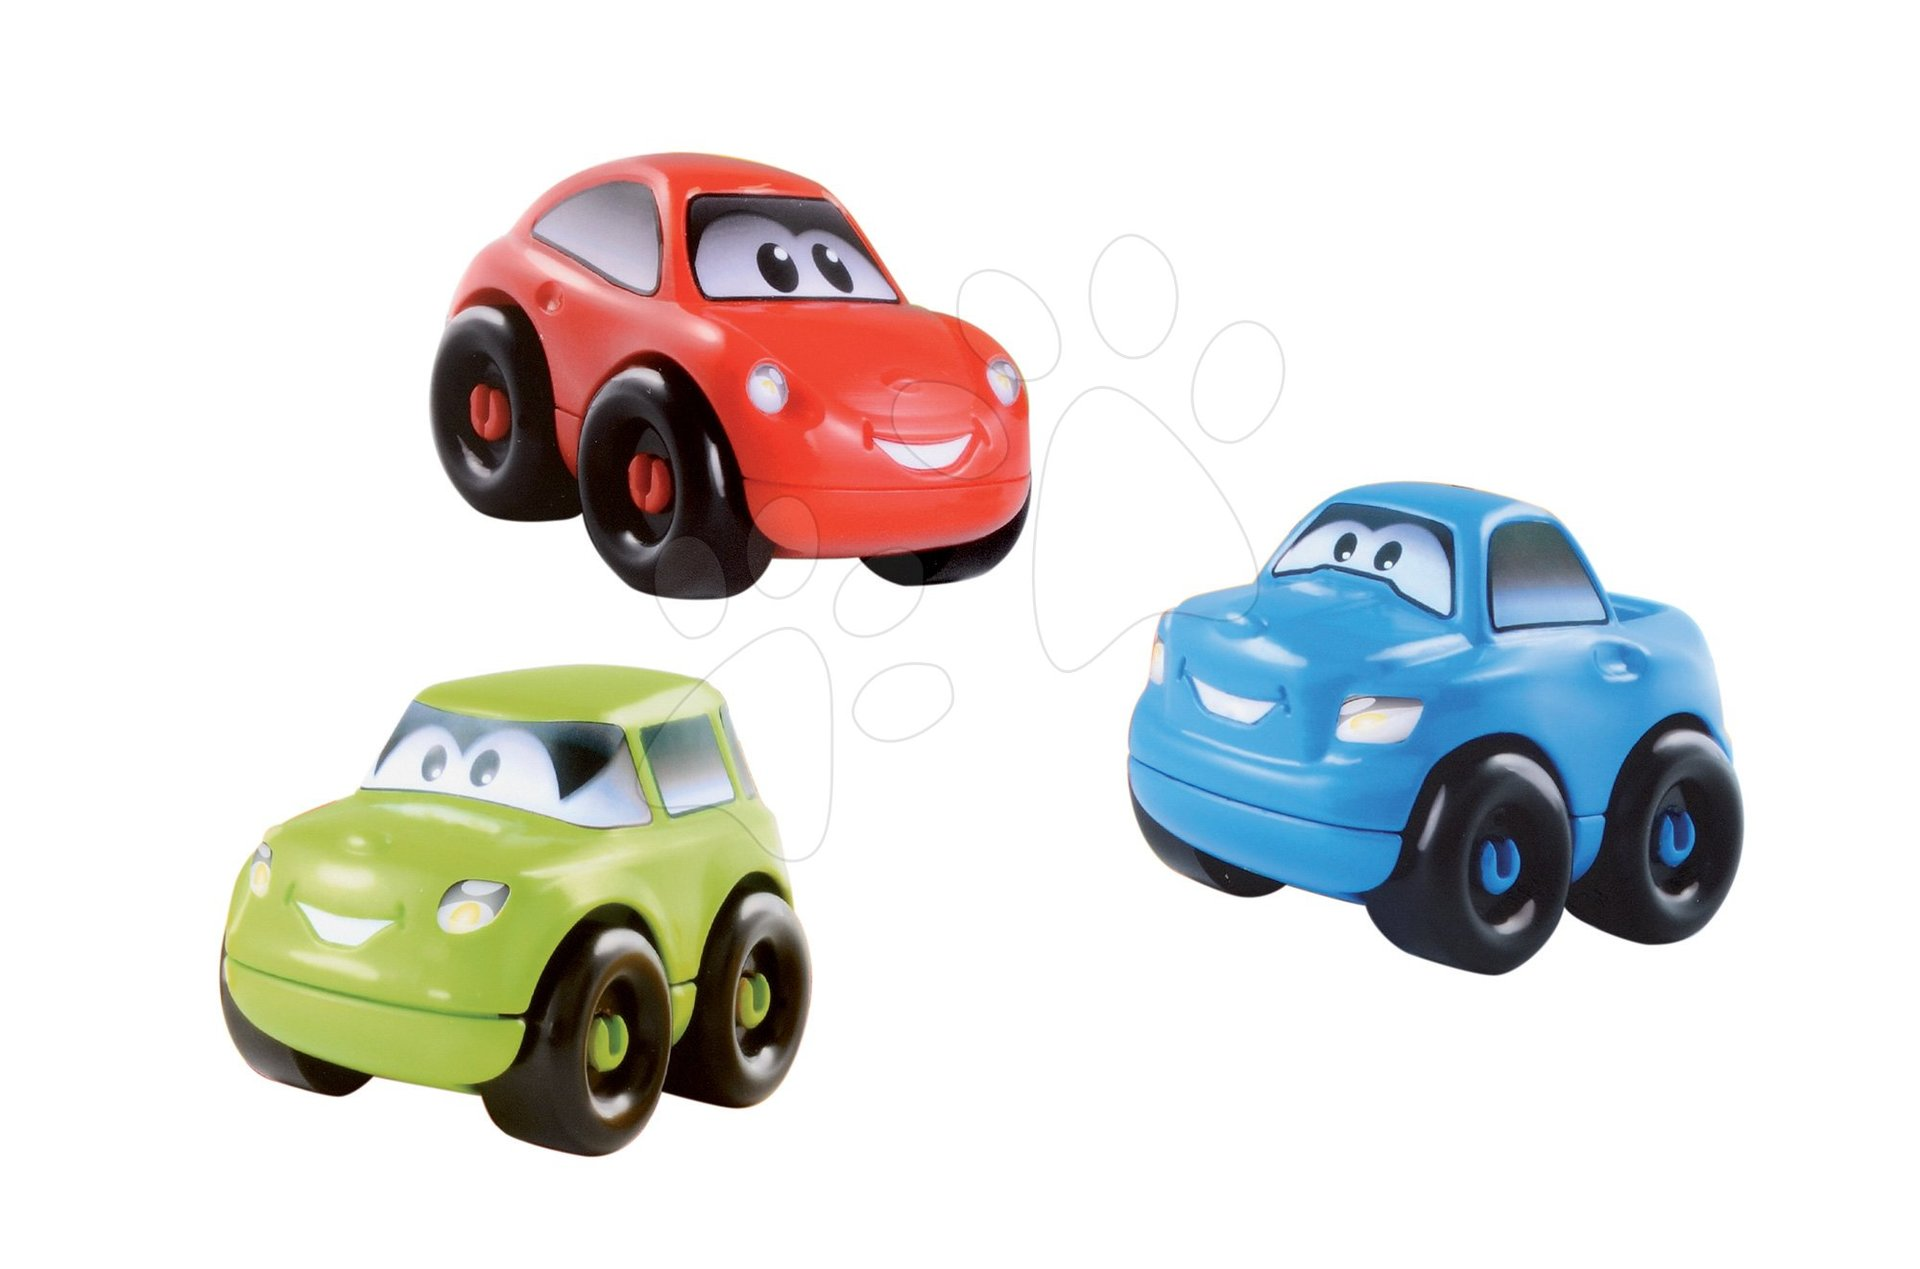 Sada 3 ch skladacích autíčok Écoiffier dĺžka 10 cm od 18 mes